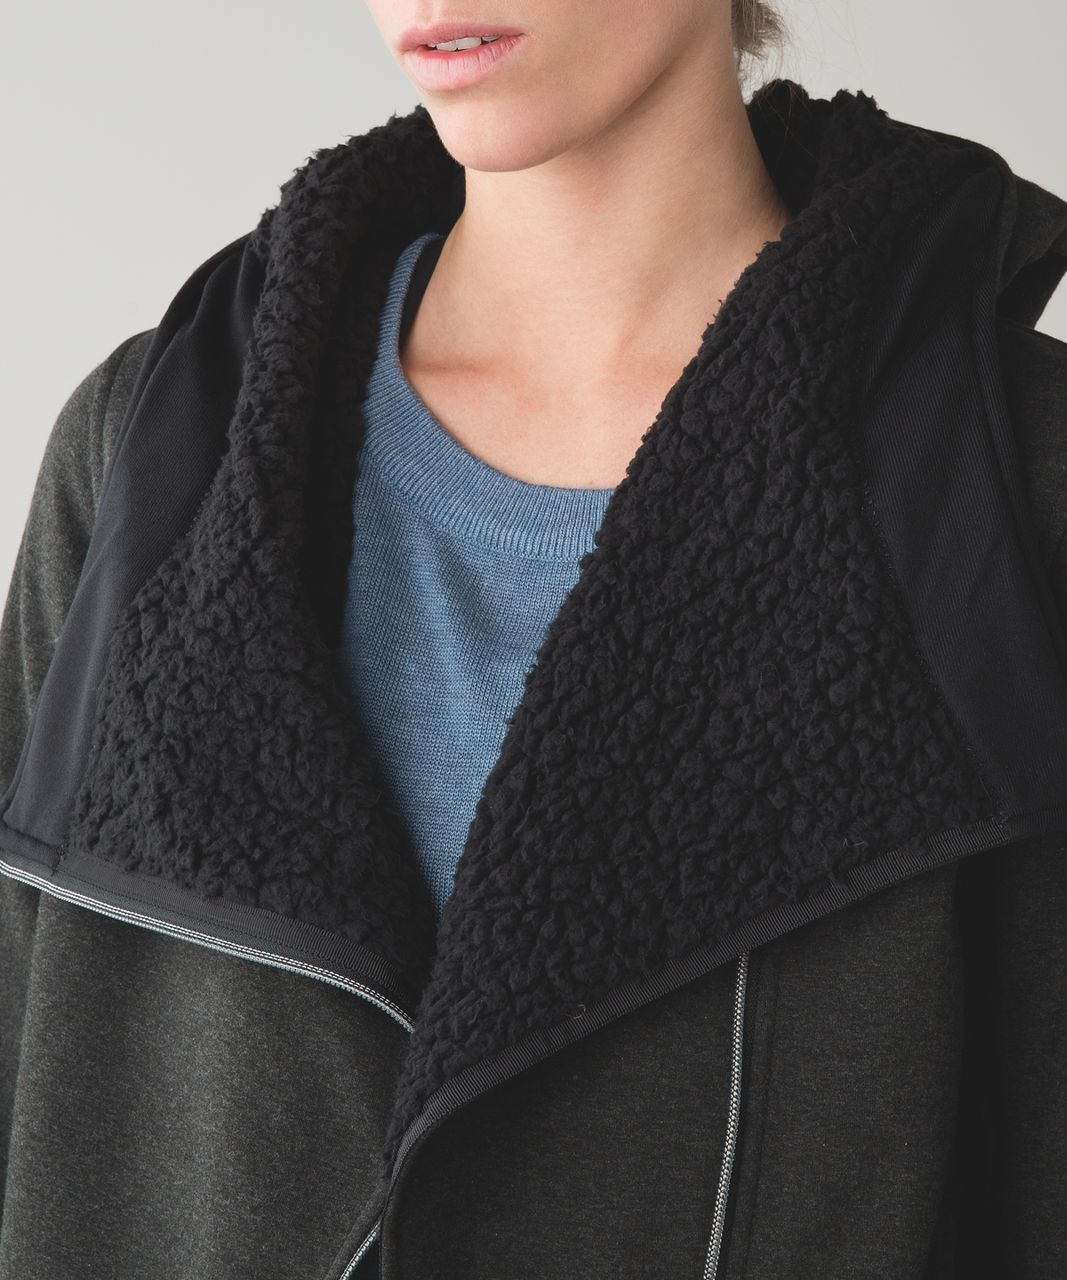 Lululemon Cozy Up Buttercup Jacket - Black